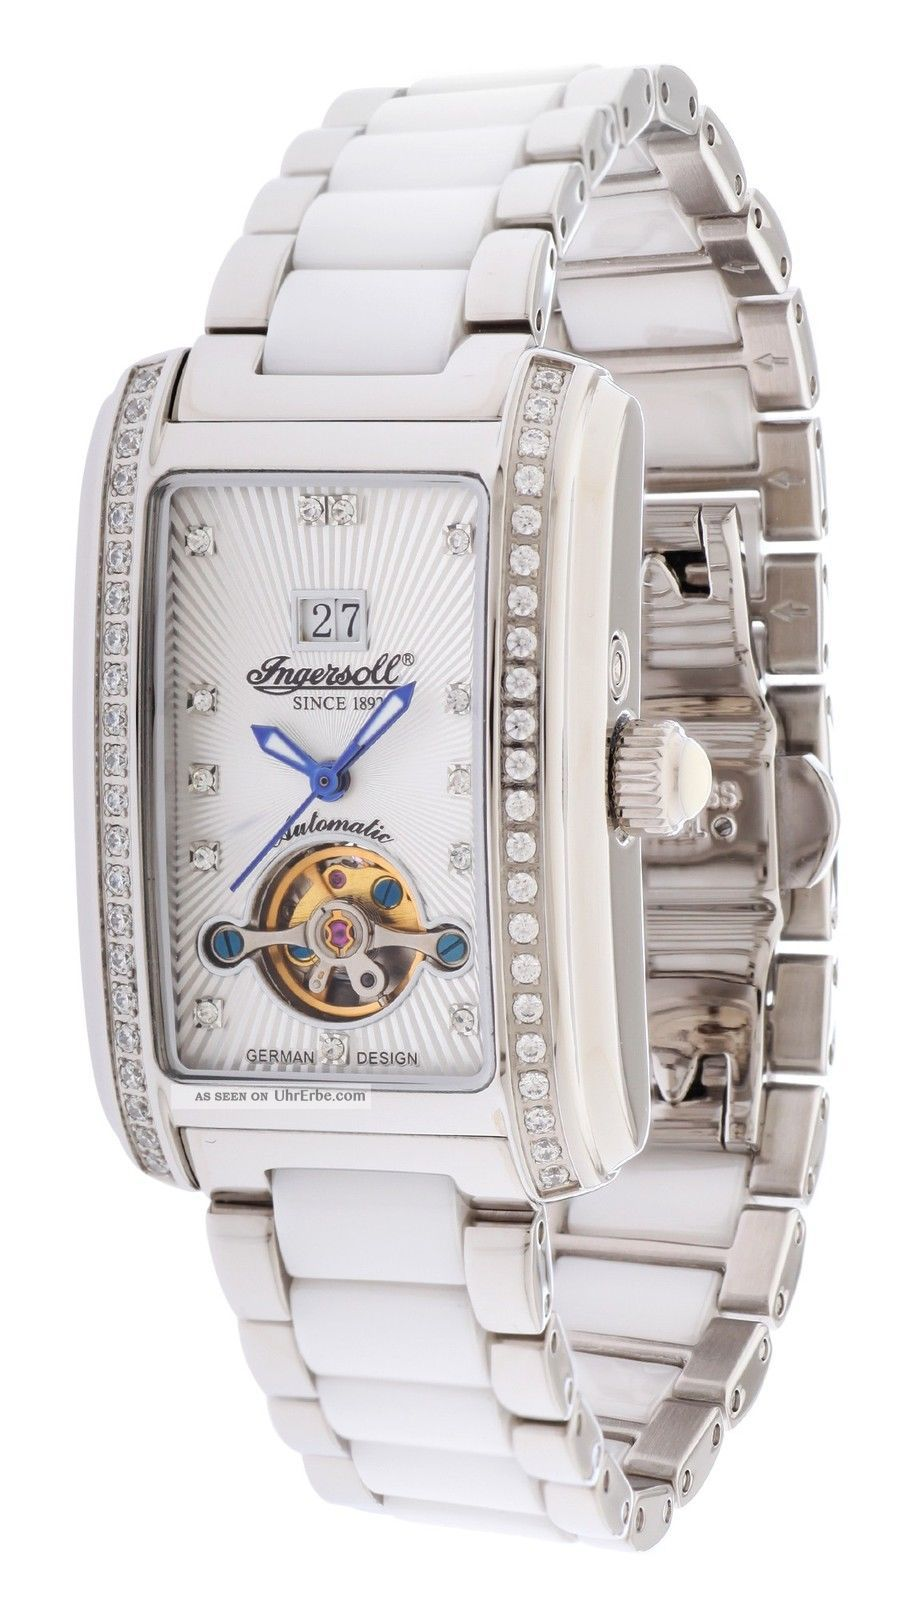 Ingersoll Damen Automatik Uhr Young Silber In5012whmb Armbanduhren Bild